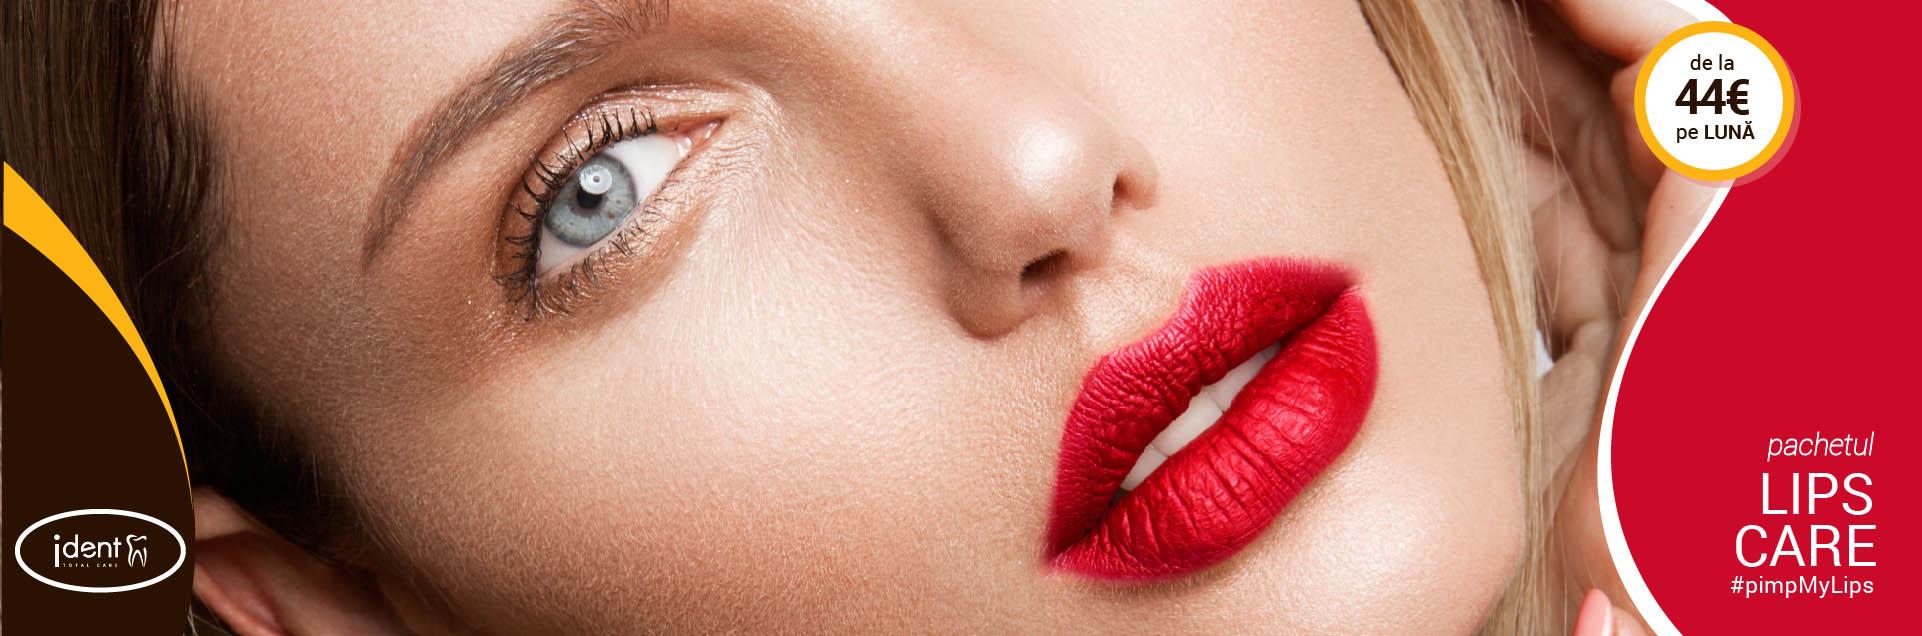 Acasa lips